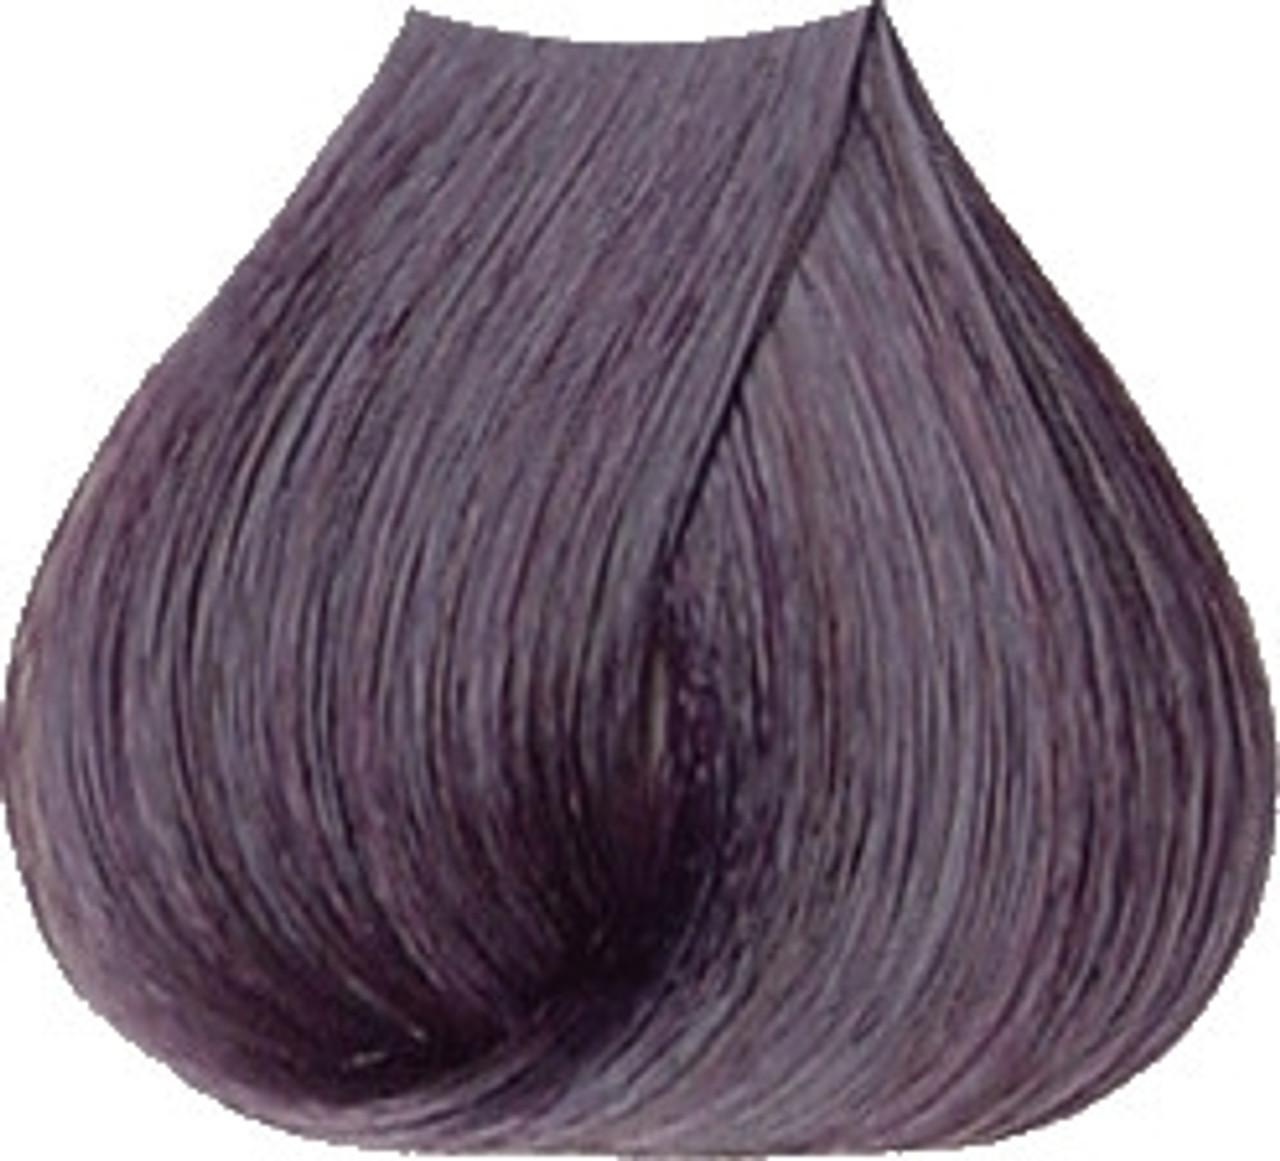 Satin Hair Color - Mahogany - 1V Violet Black